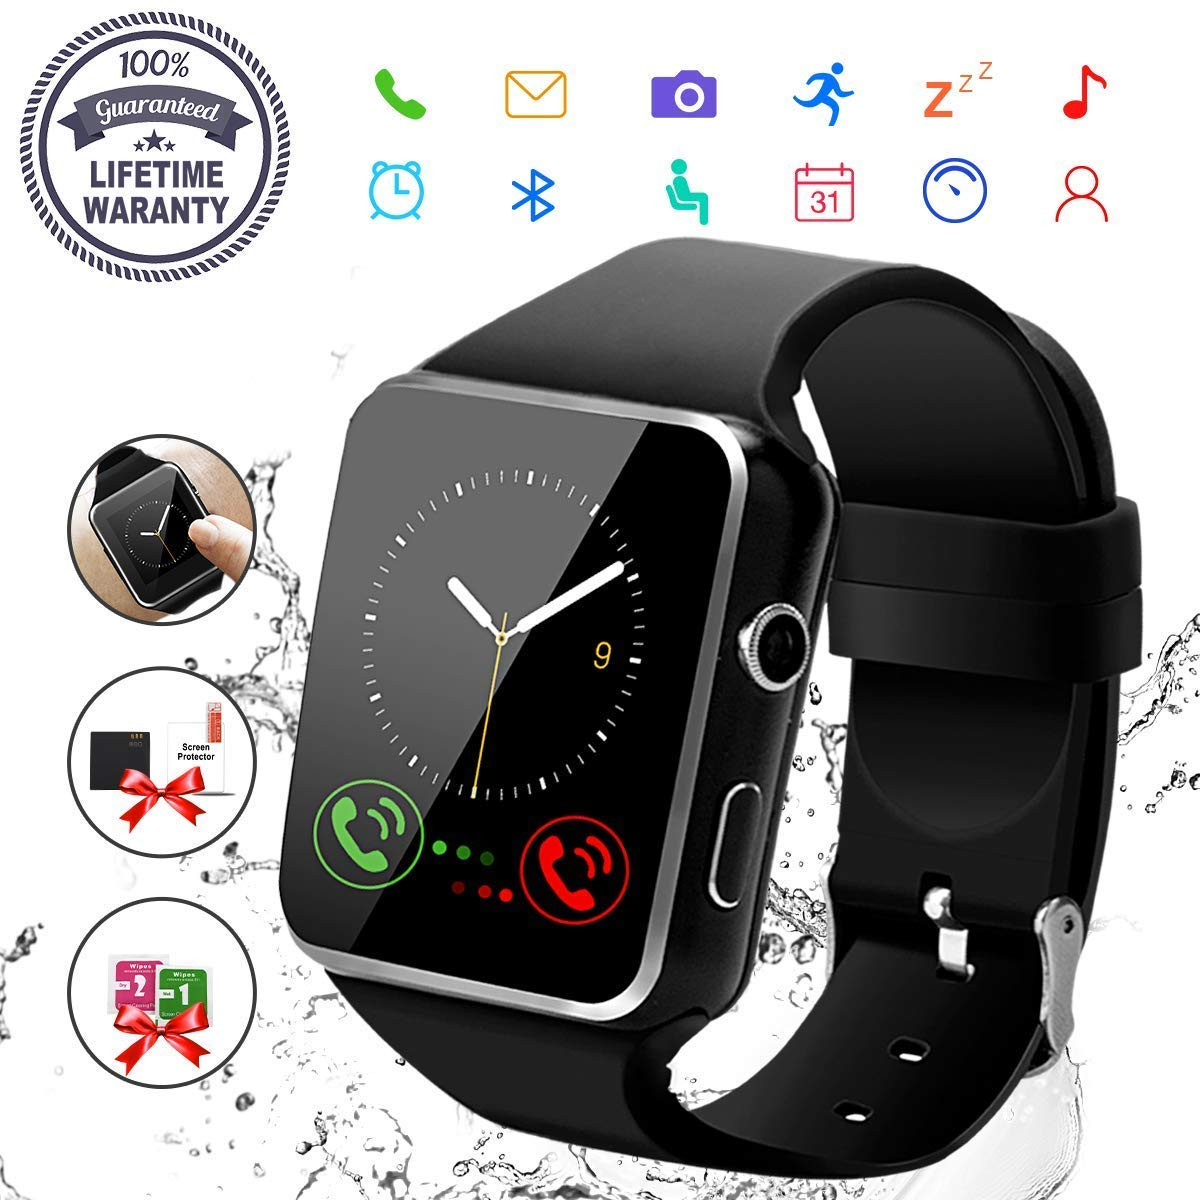 Smart Watch,Bluetooth Smartwatch Touch Screen Wrist Watch with Camera/SIM Card Slot,Waterproof Phone Smart Watch for Men Women Sports Fitness Tracker ...